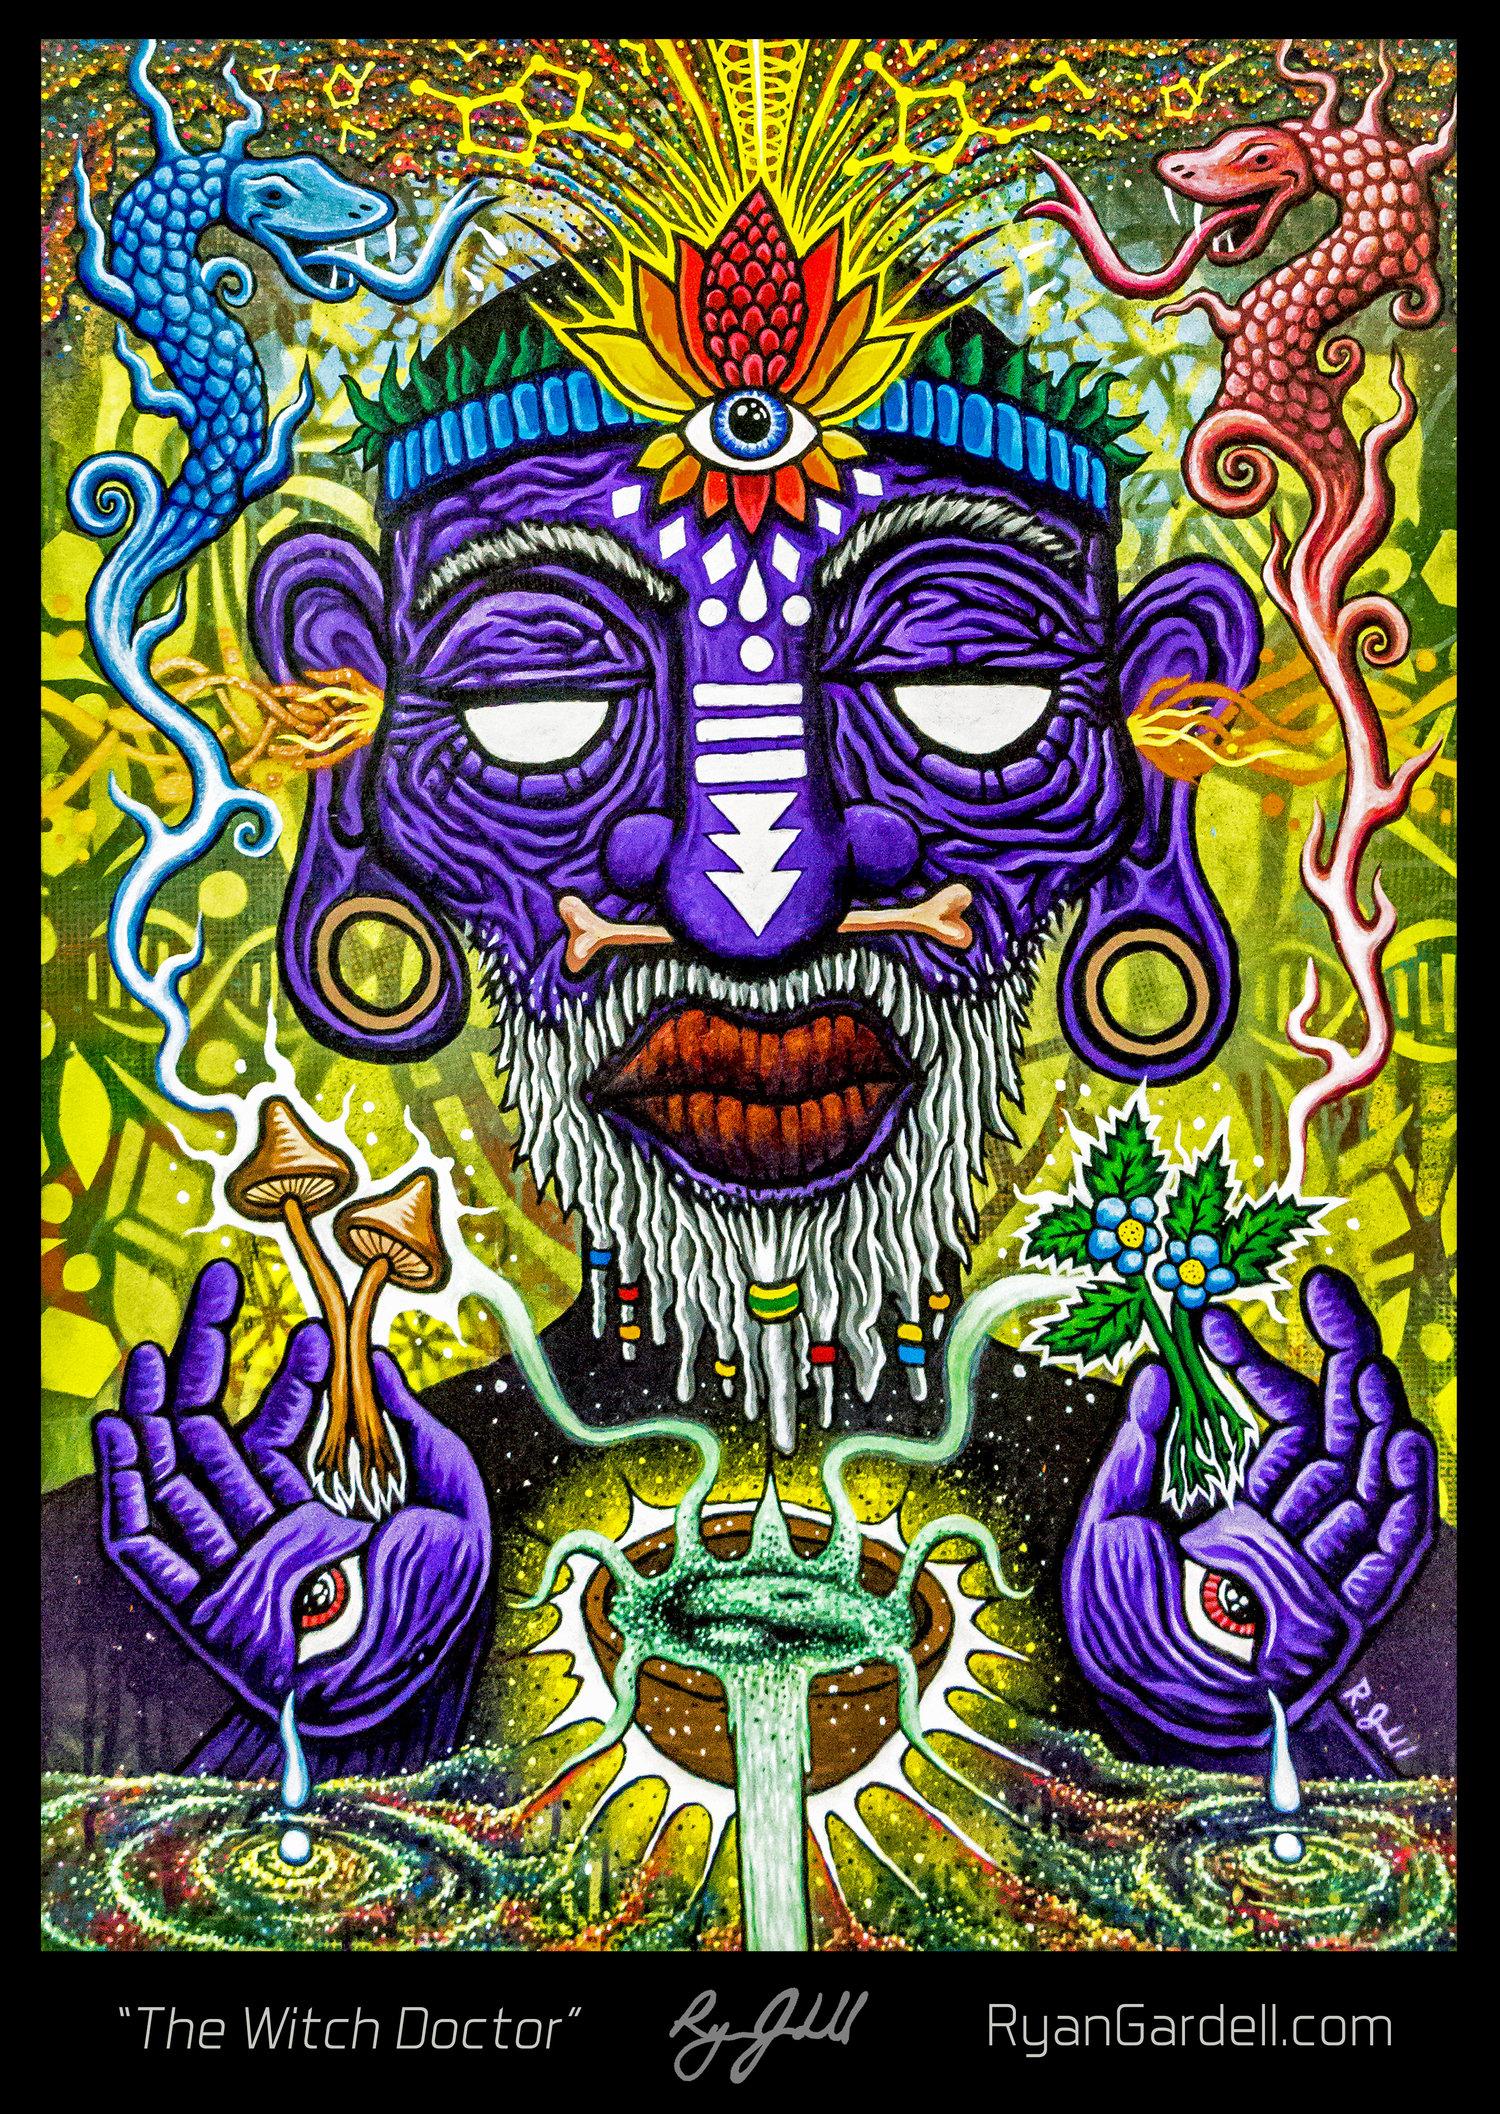 The Witch Doctor - Original Painting Release — Artifakt Studioss